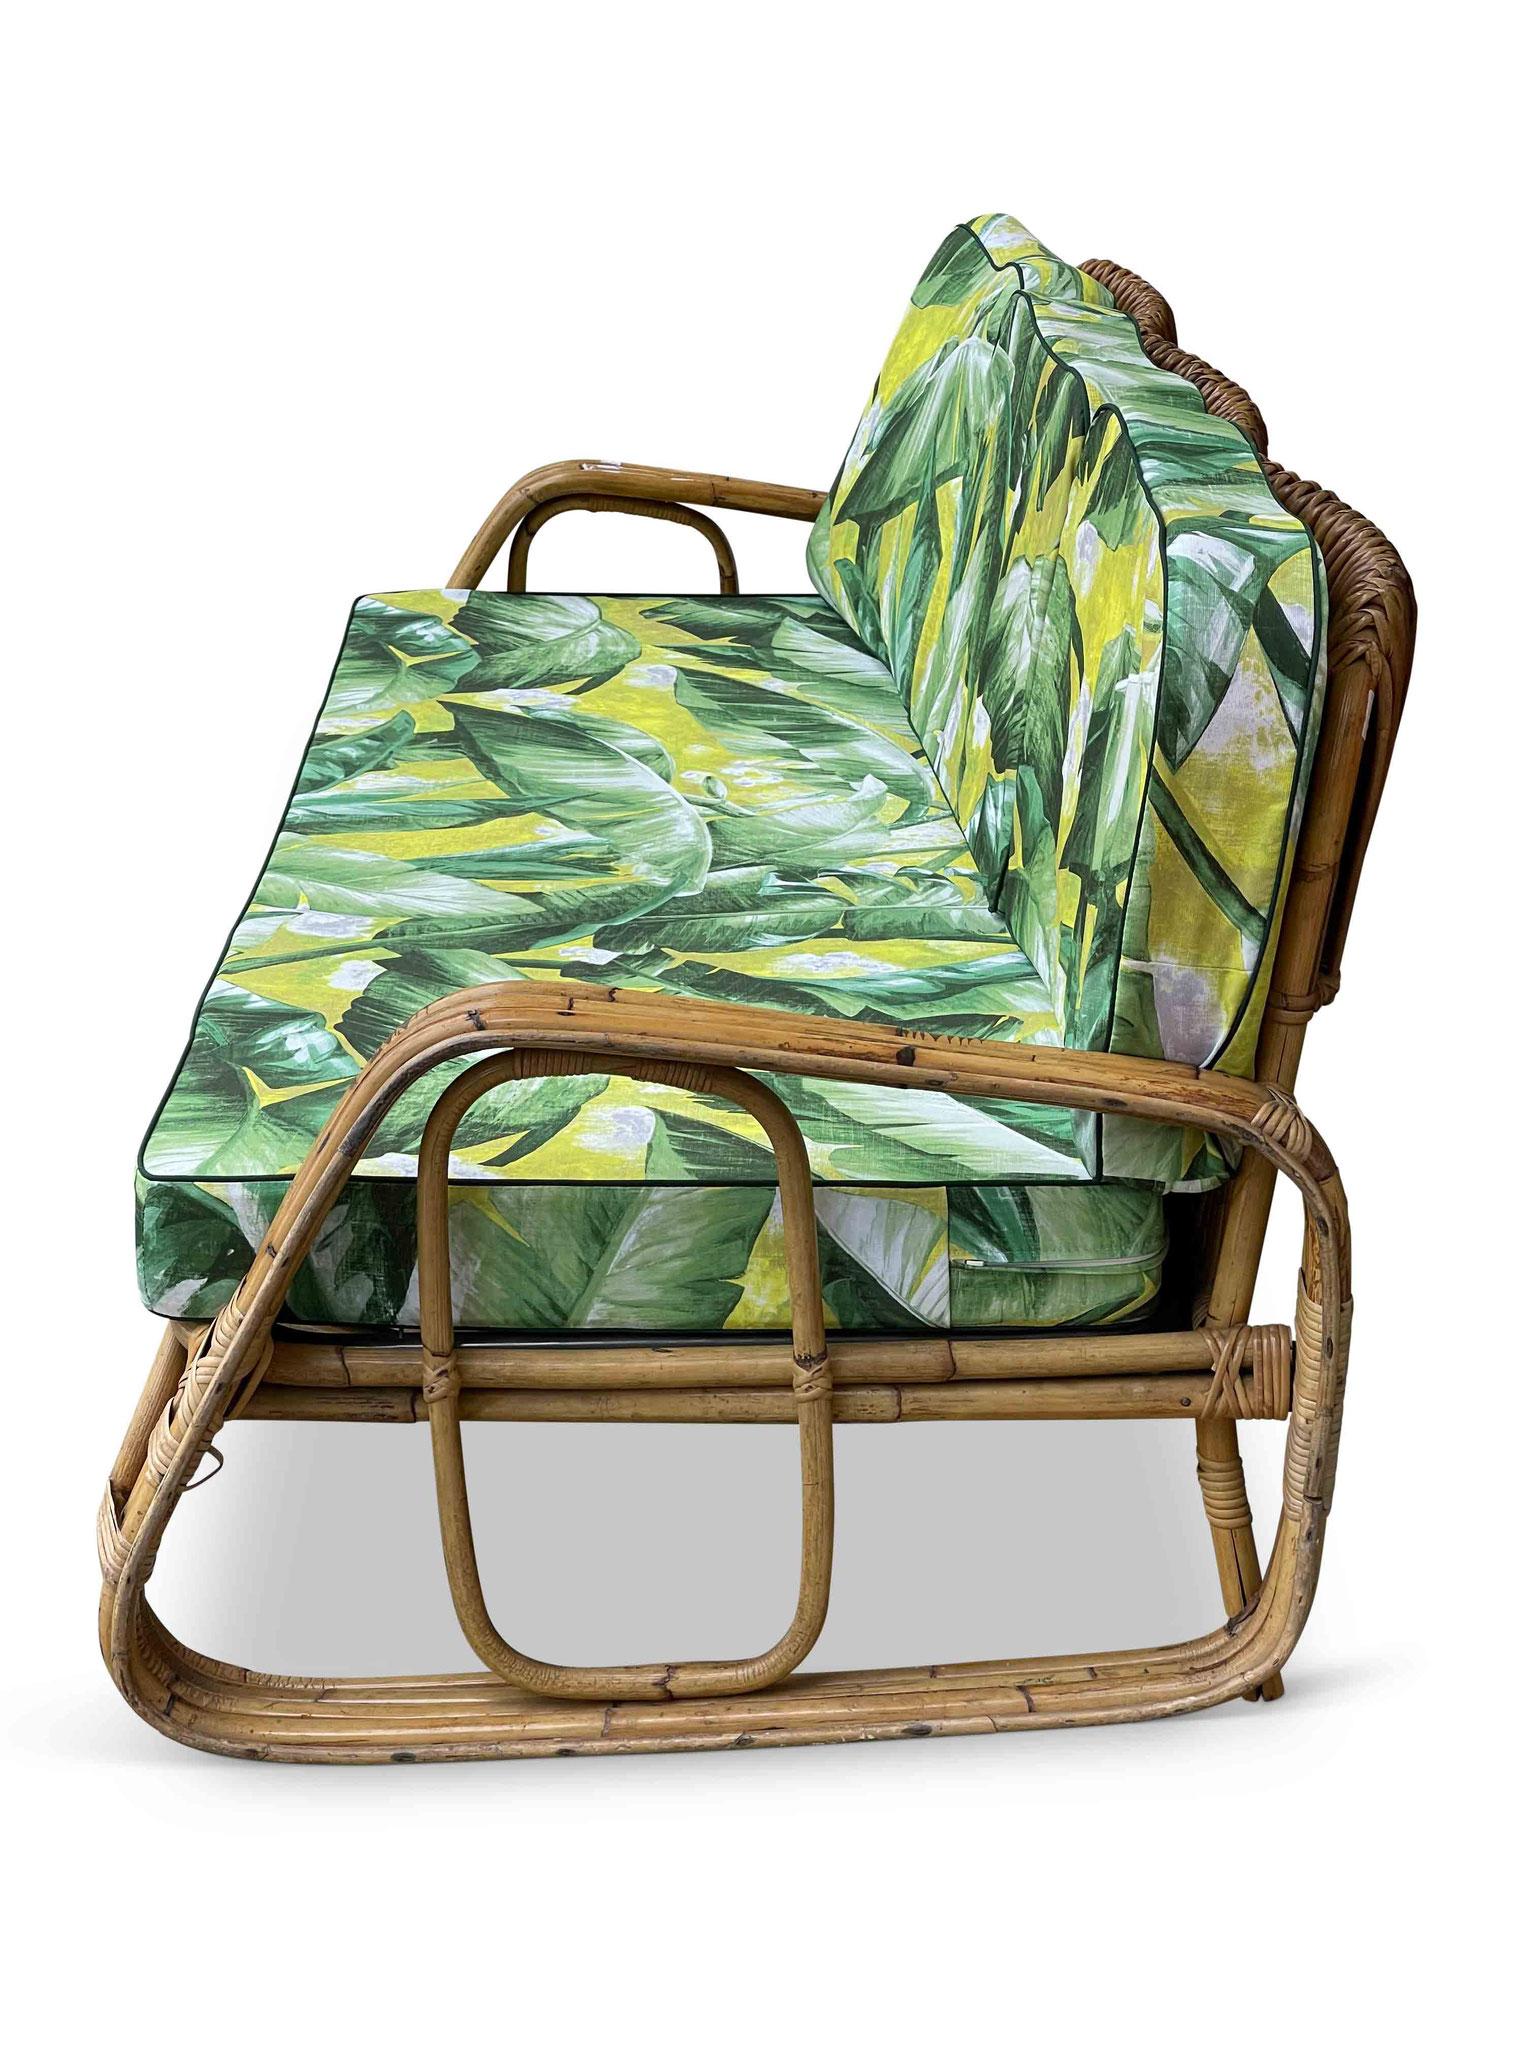 divano vintage rattan bamboo tito agnoli bonacina